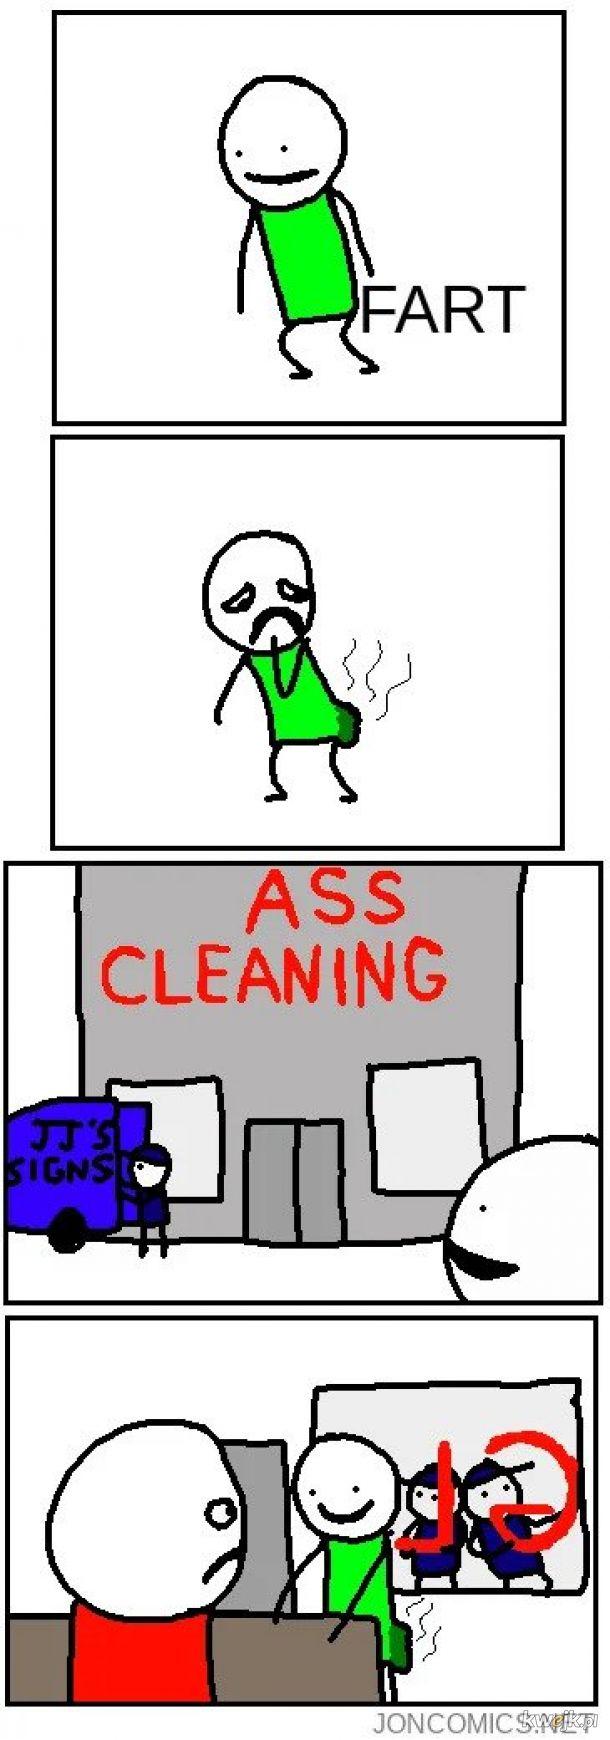 GL-ASS CLEANING